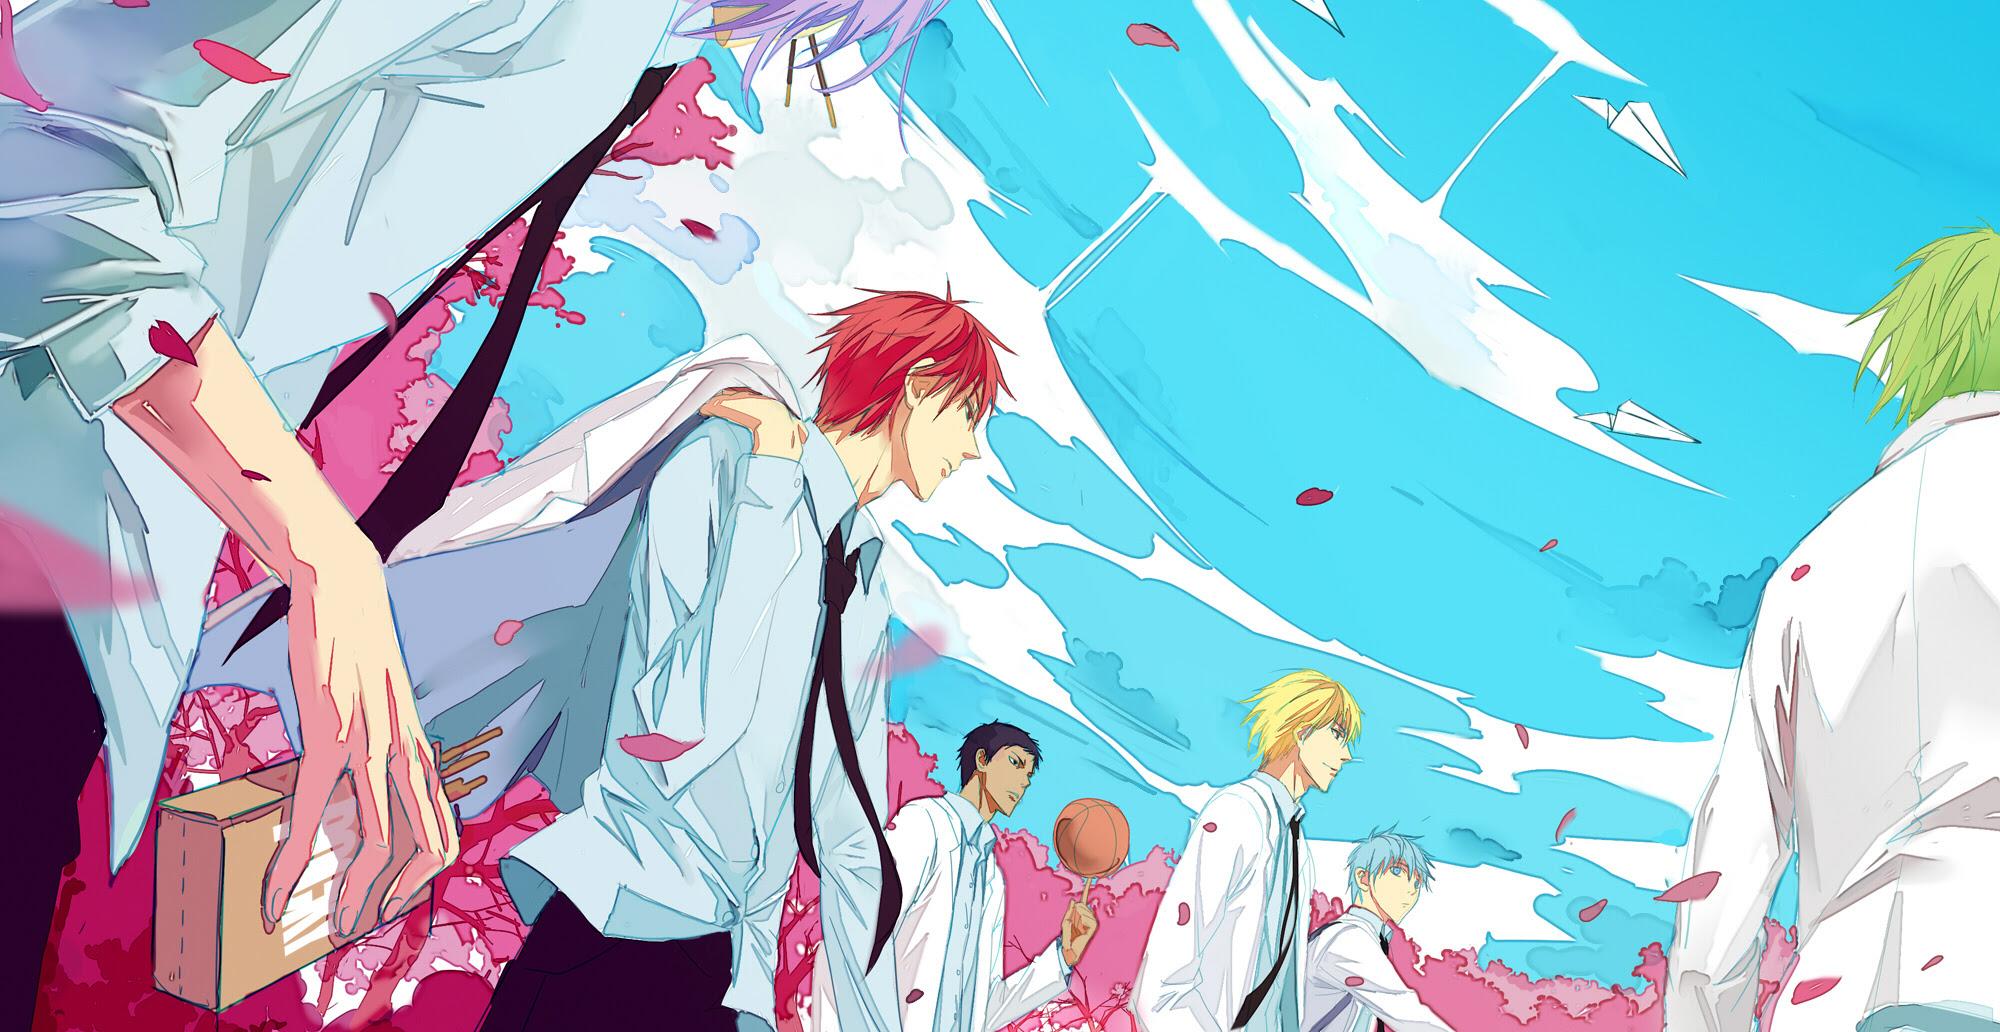 Anime Kuroko No Basket Wallpaper Backgro 黒子のバスケ 壁紙